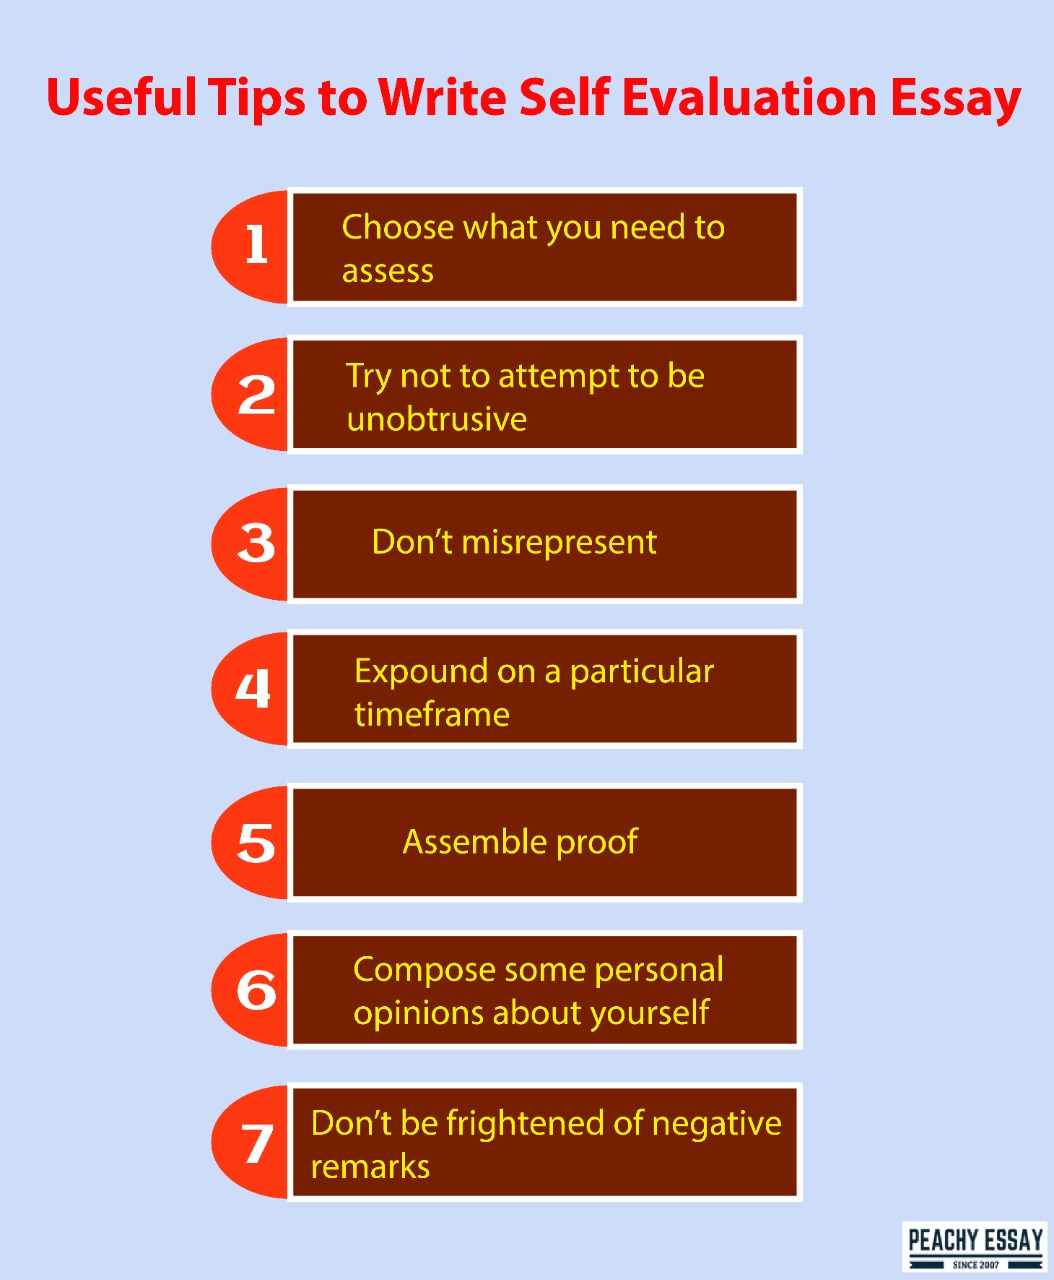 tips to write self evaluation essay